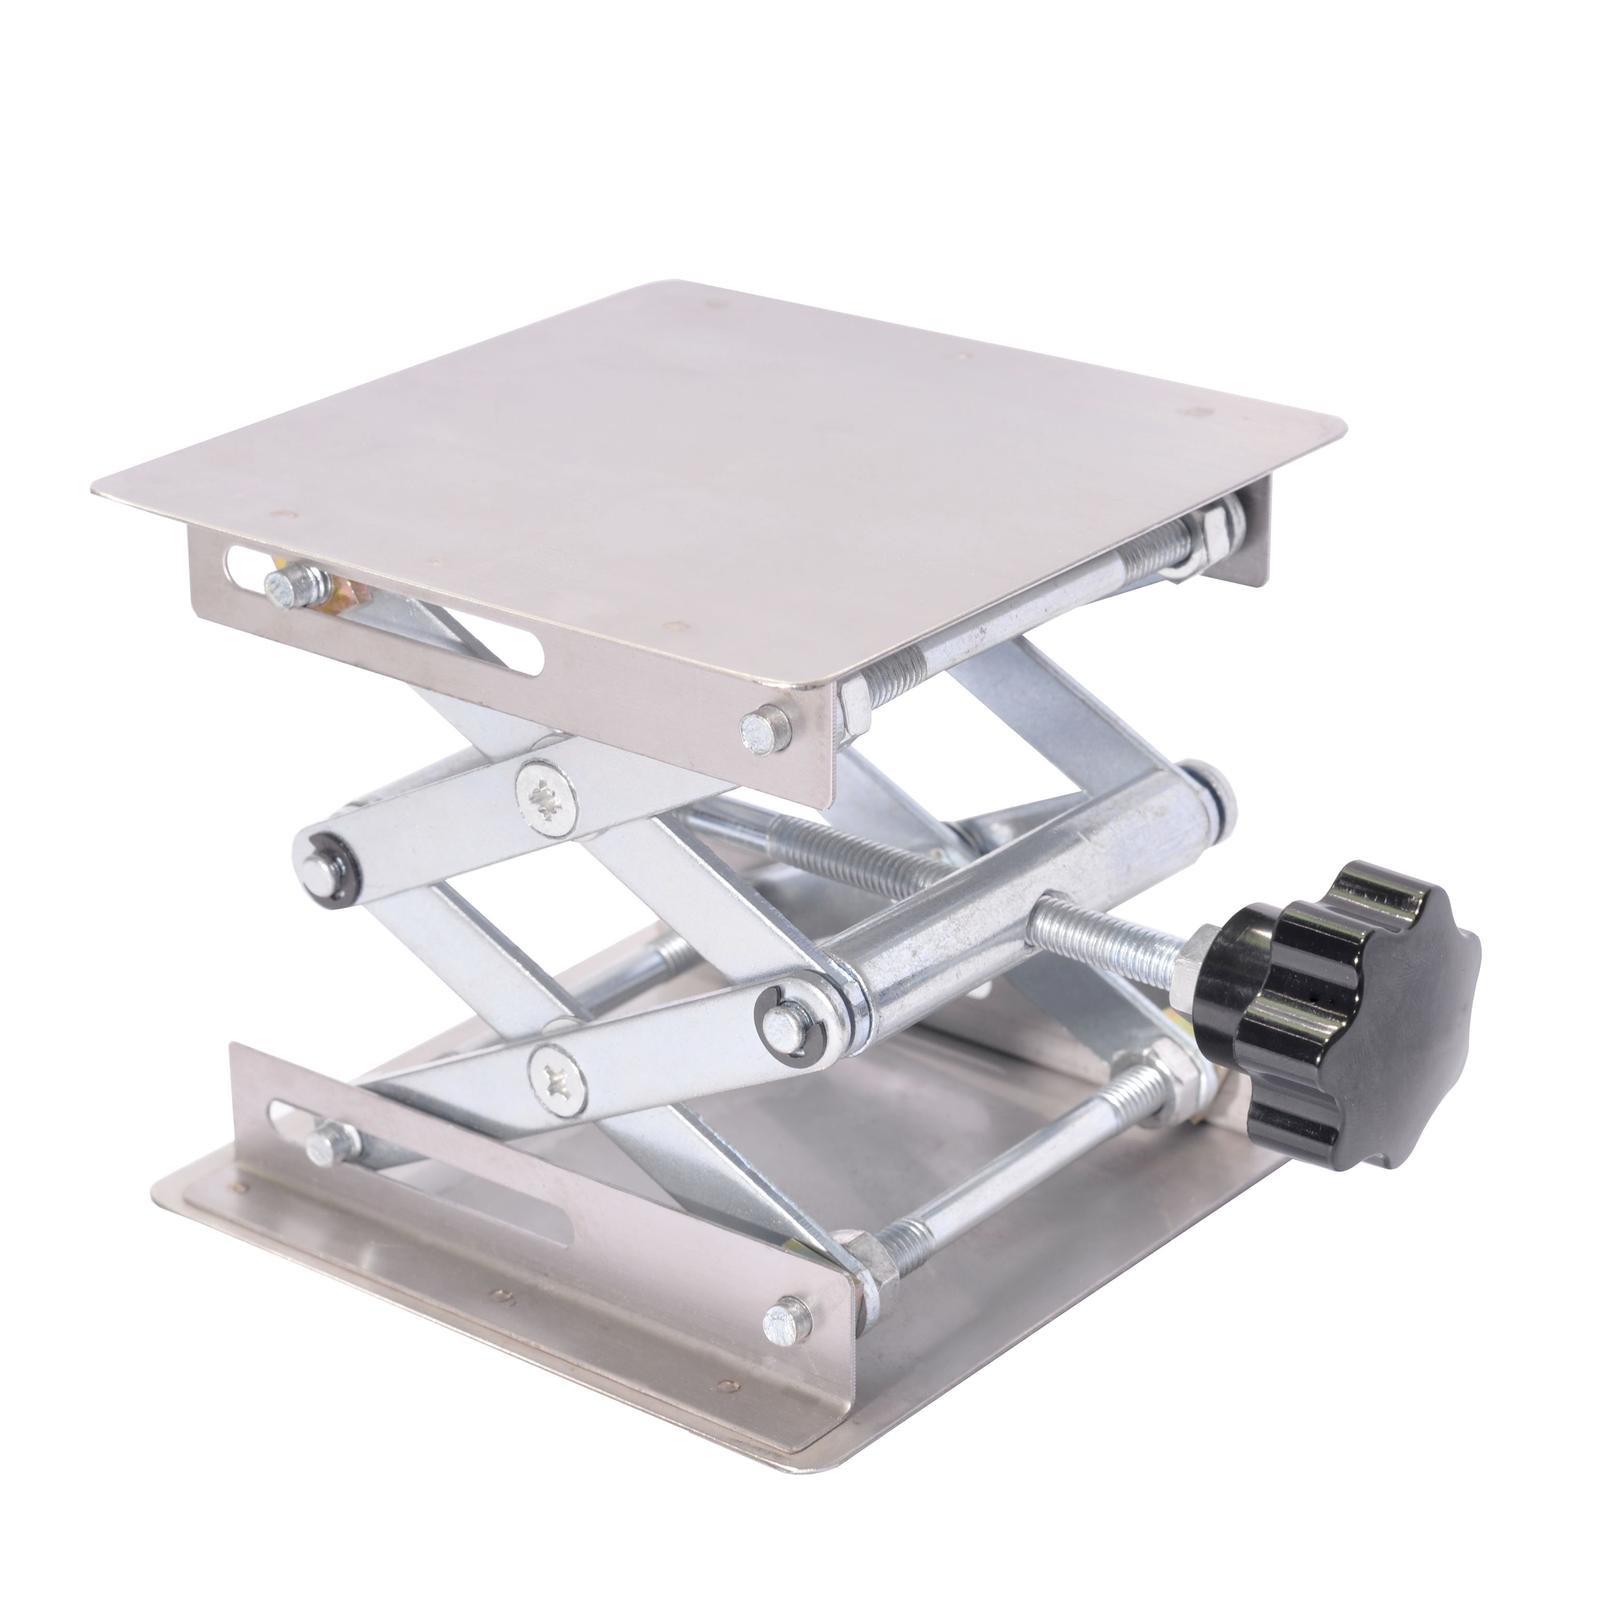 Pronghorn Lab Scissor Lift Platform Stand Jack 4 x 4 Inch